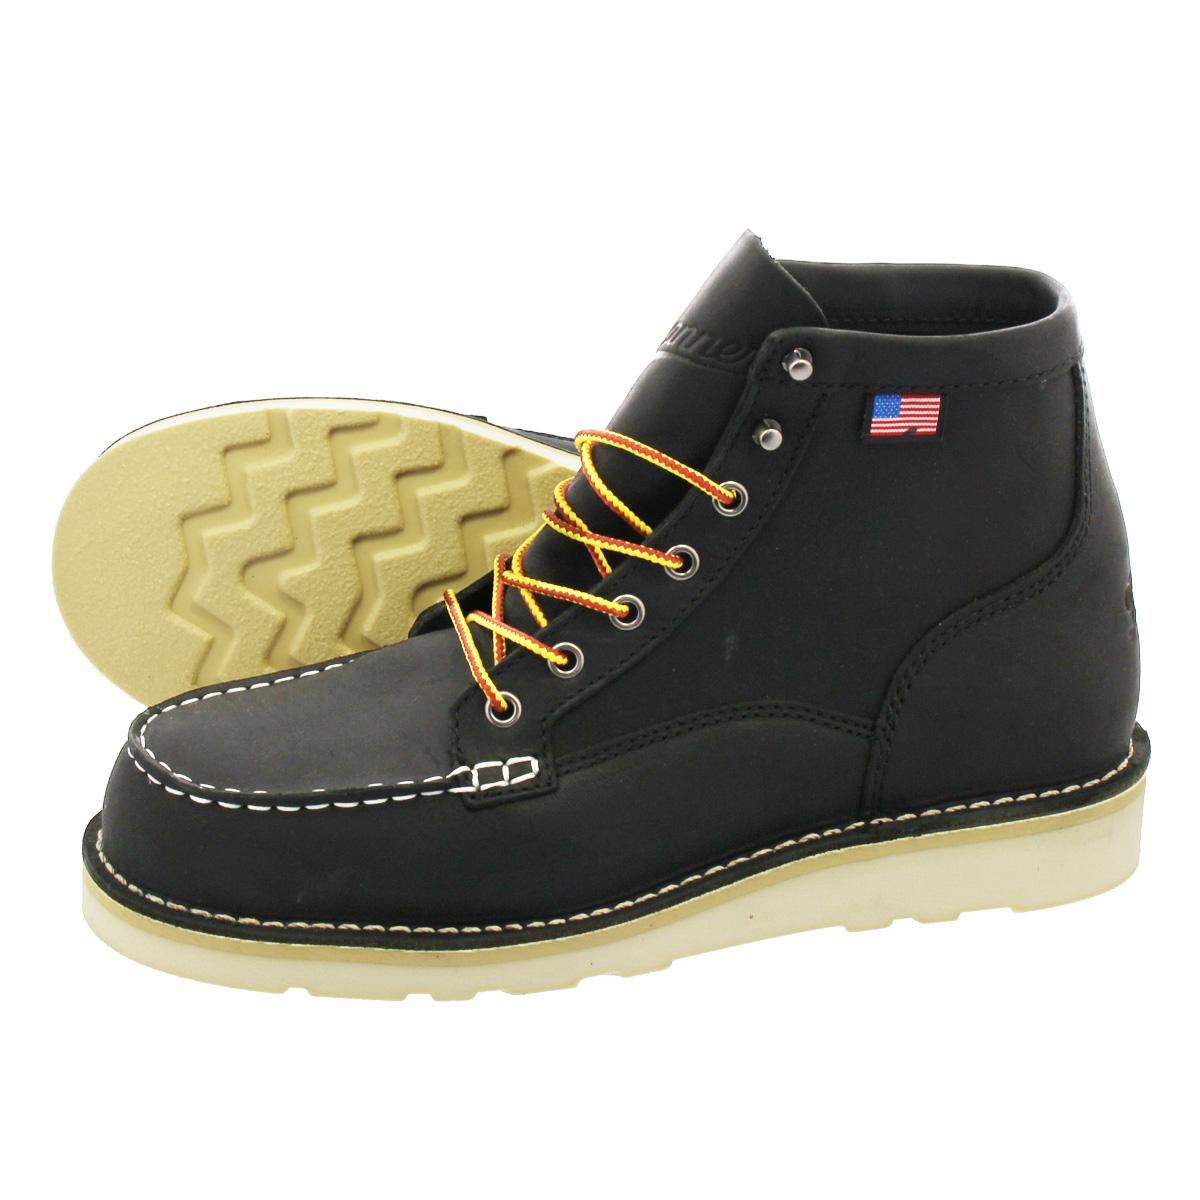 DANNER BULL RUN MOC TOE 6INCH BOOT 【MADE IN U.S.A.】 【D WIDTH】ダナー ブル ラン モック トゥ 6インチ ブーツ BLACK 15568